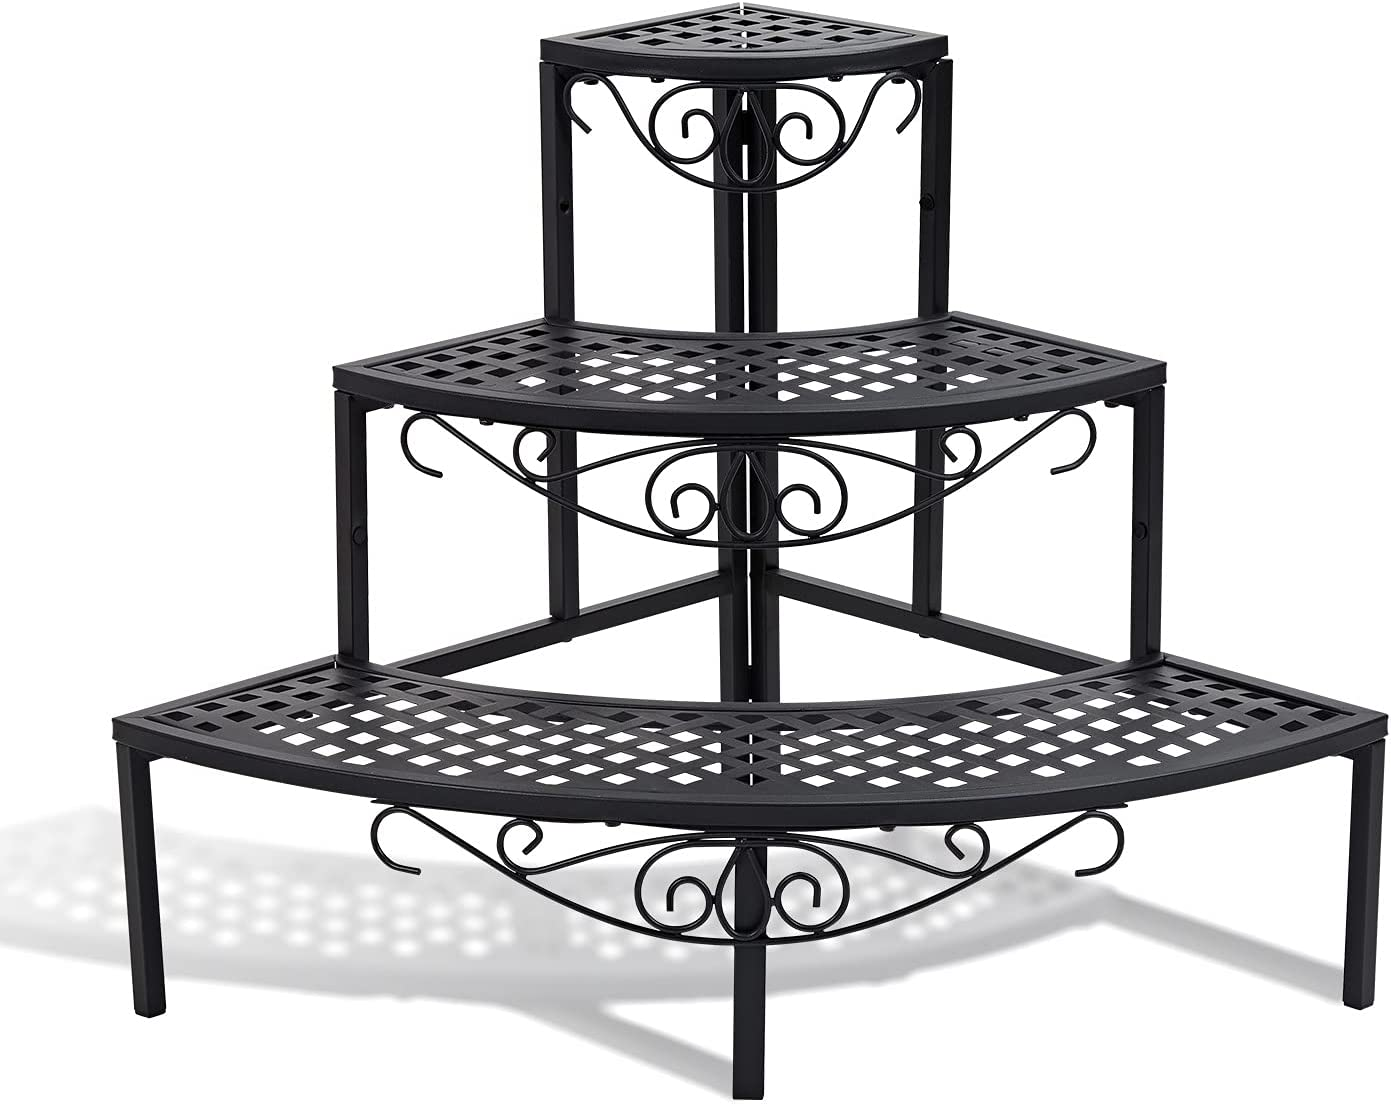 3 Tier Metal Plant Stand,Rectangle or Round Decorative Flower Step,Garden Shelf Flower Pot Holder Storage Organizer Rack for Indoor Outdoor Use (23.6